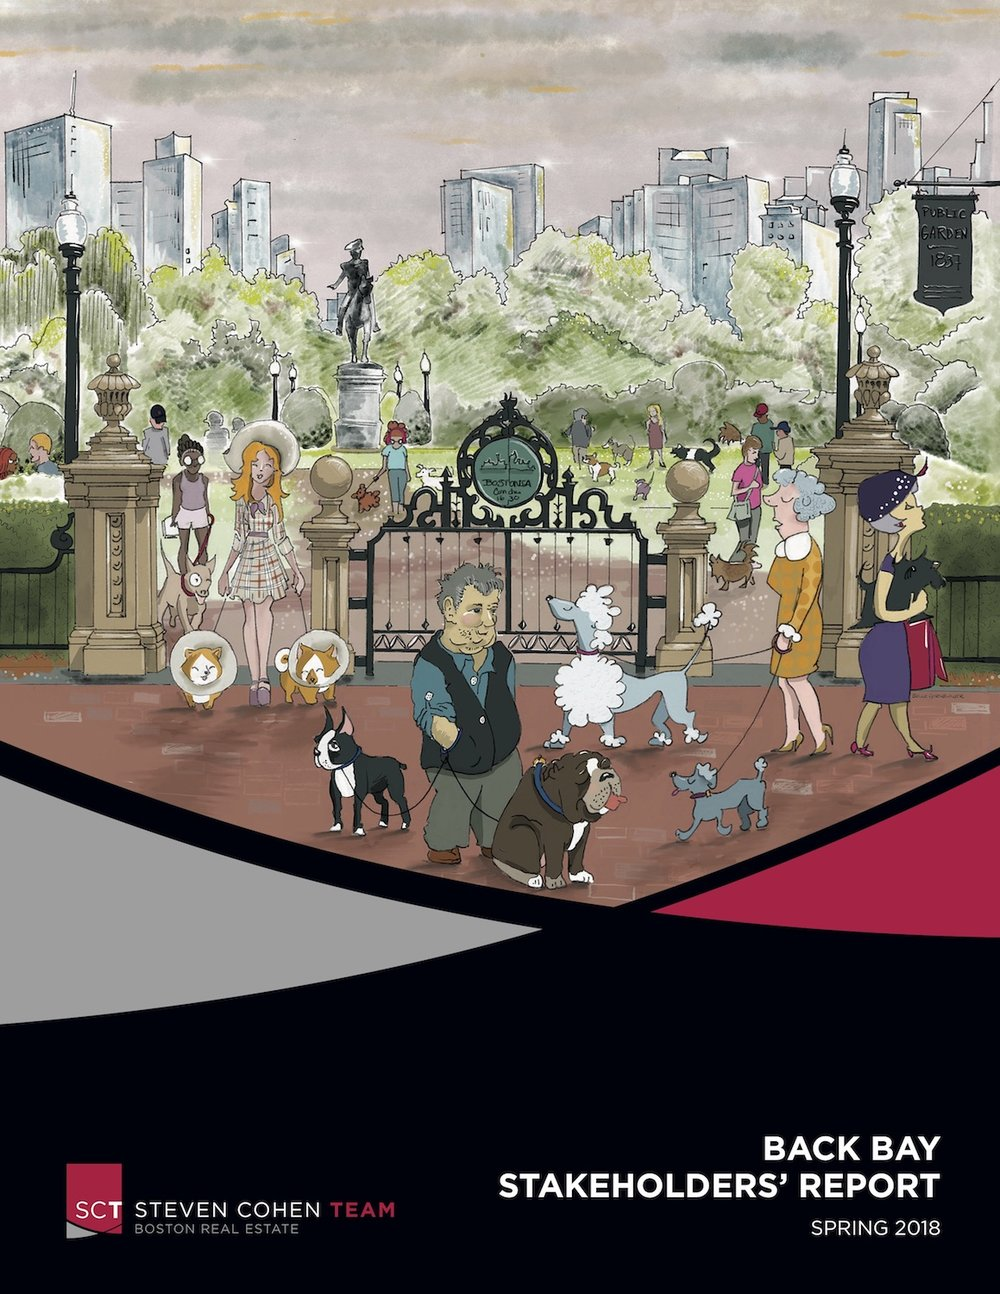 Back Bay Stakeholders' Report Spring 2018.jpg